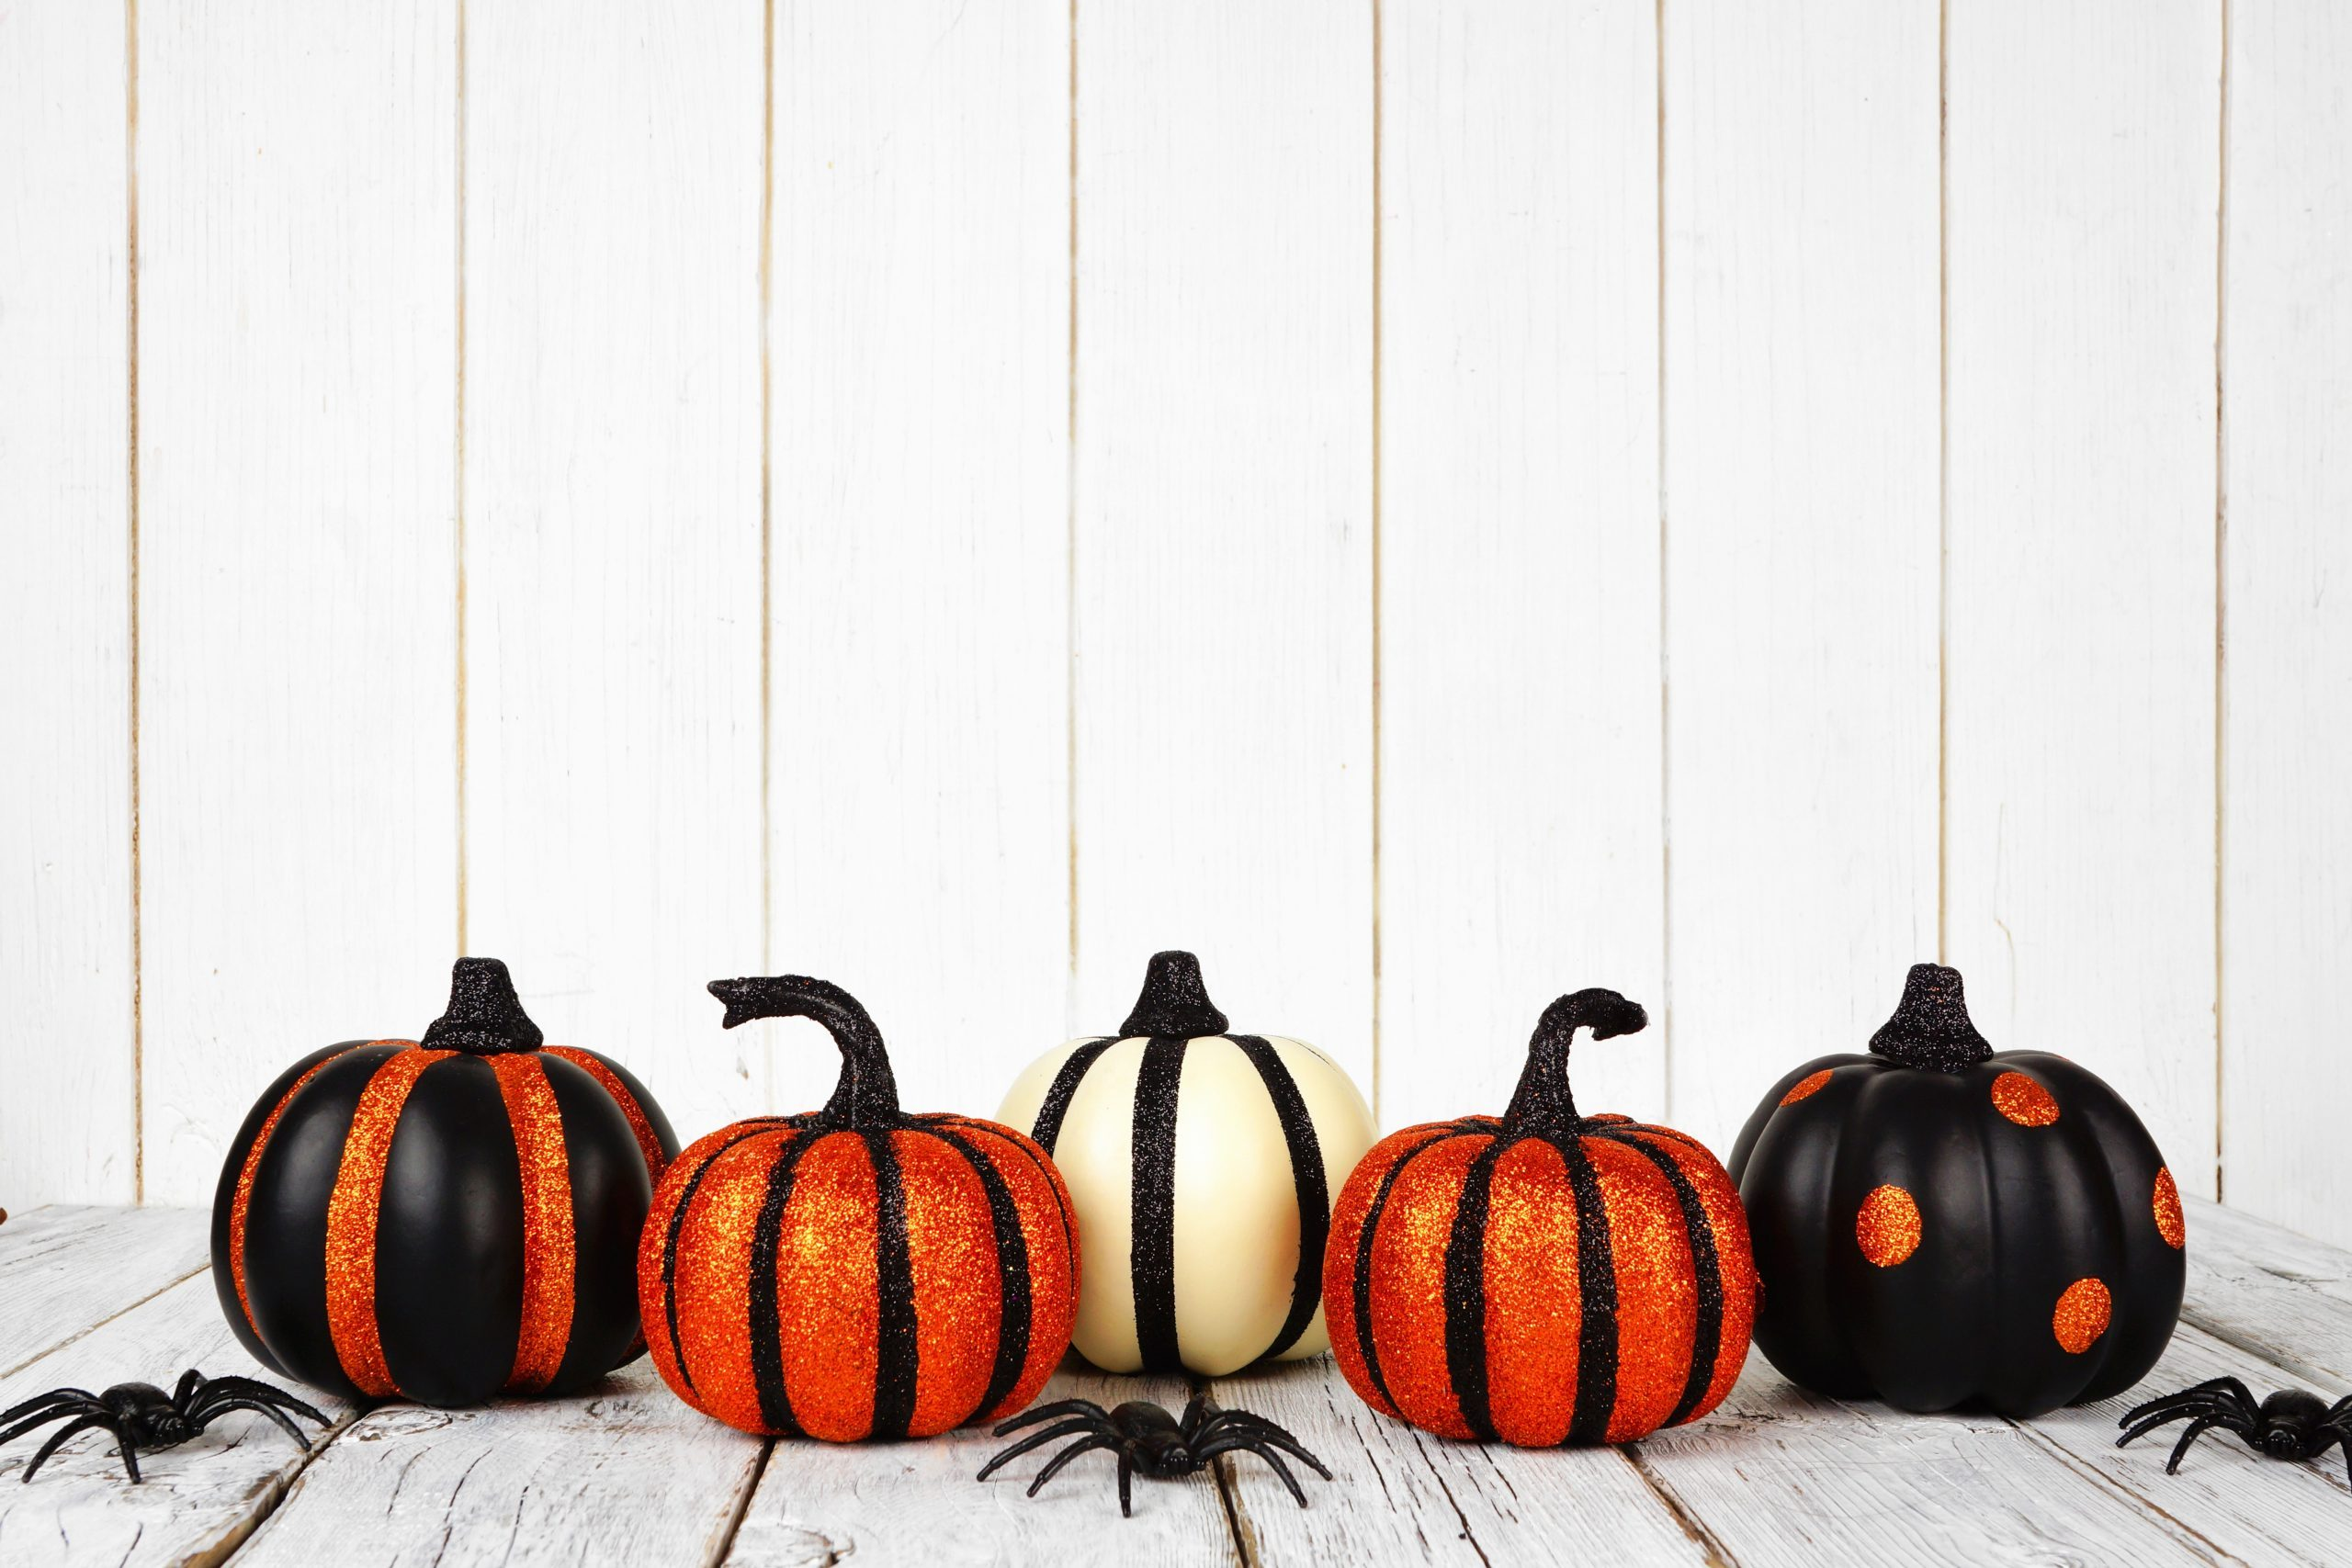 Black and orange glittery Halloween pumpkins against a white wood background